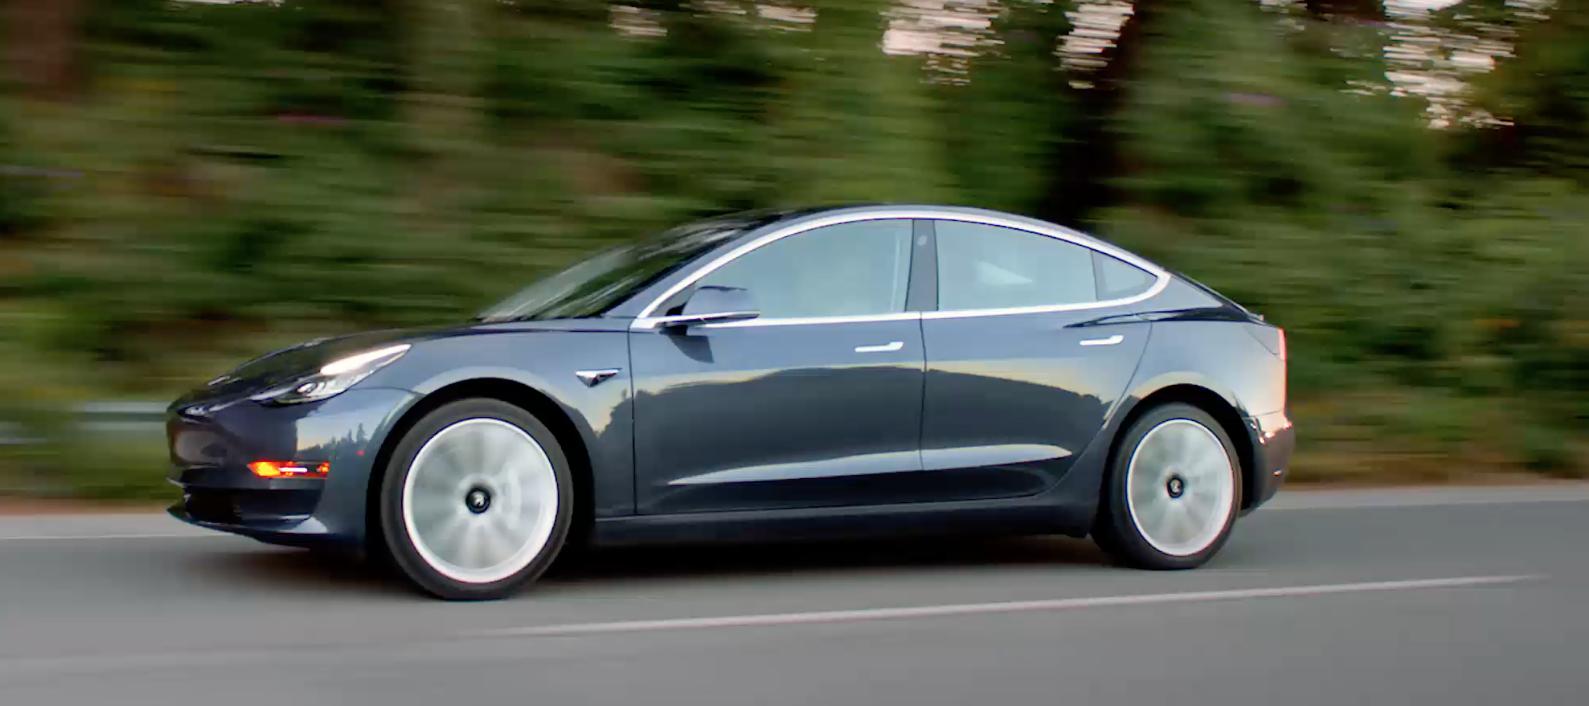 Tesla Model 3: Elon Musk Reveals New Extras, Next-Gen